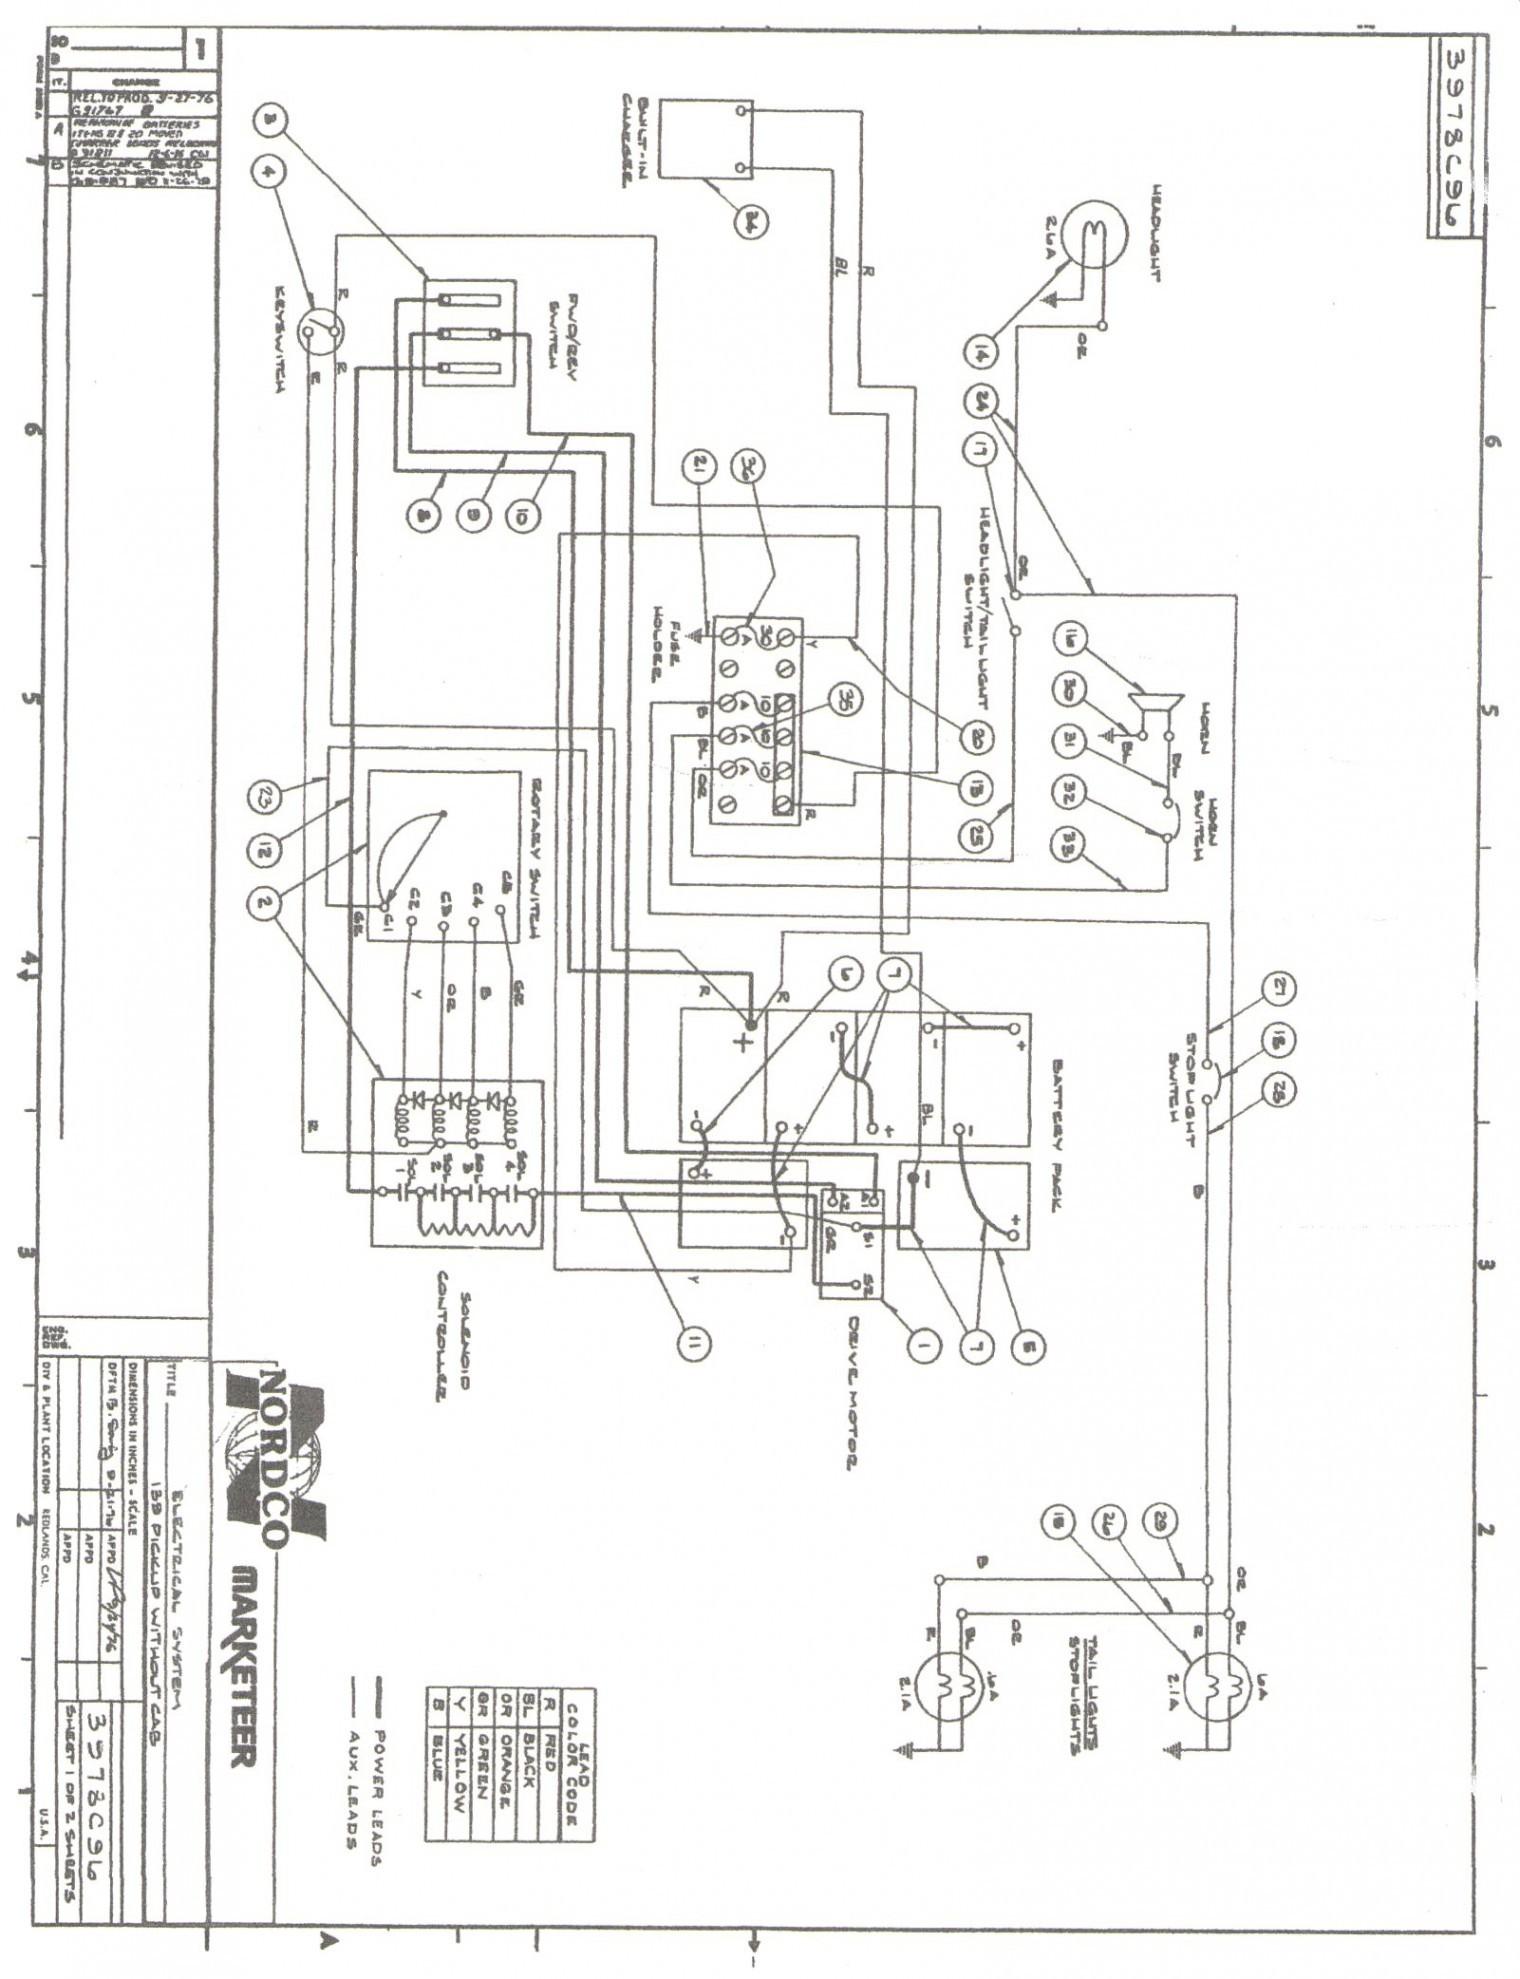 hight resolution of  ezgo golf cart wiring diagram 36 volt 1998 auto electrical wiring western golf cart wiring